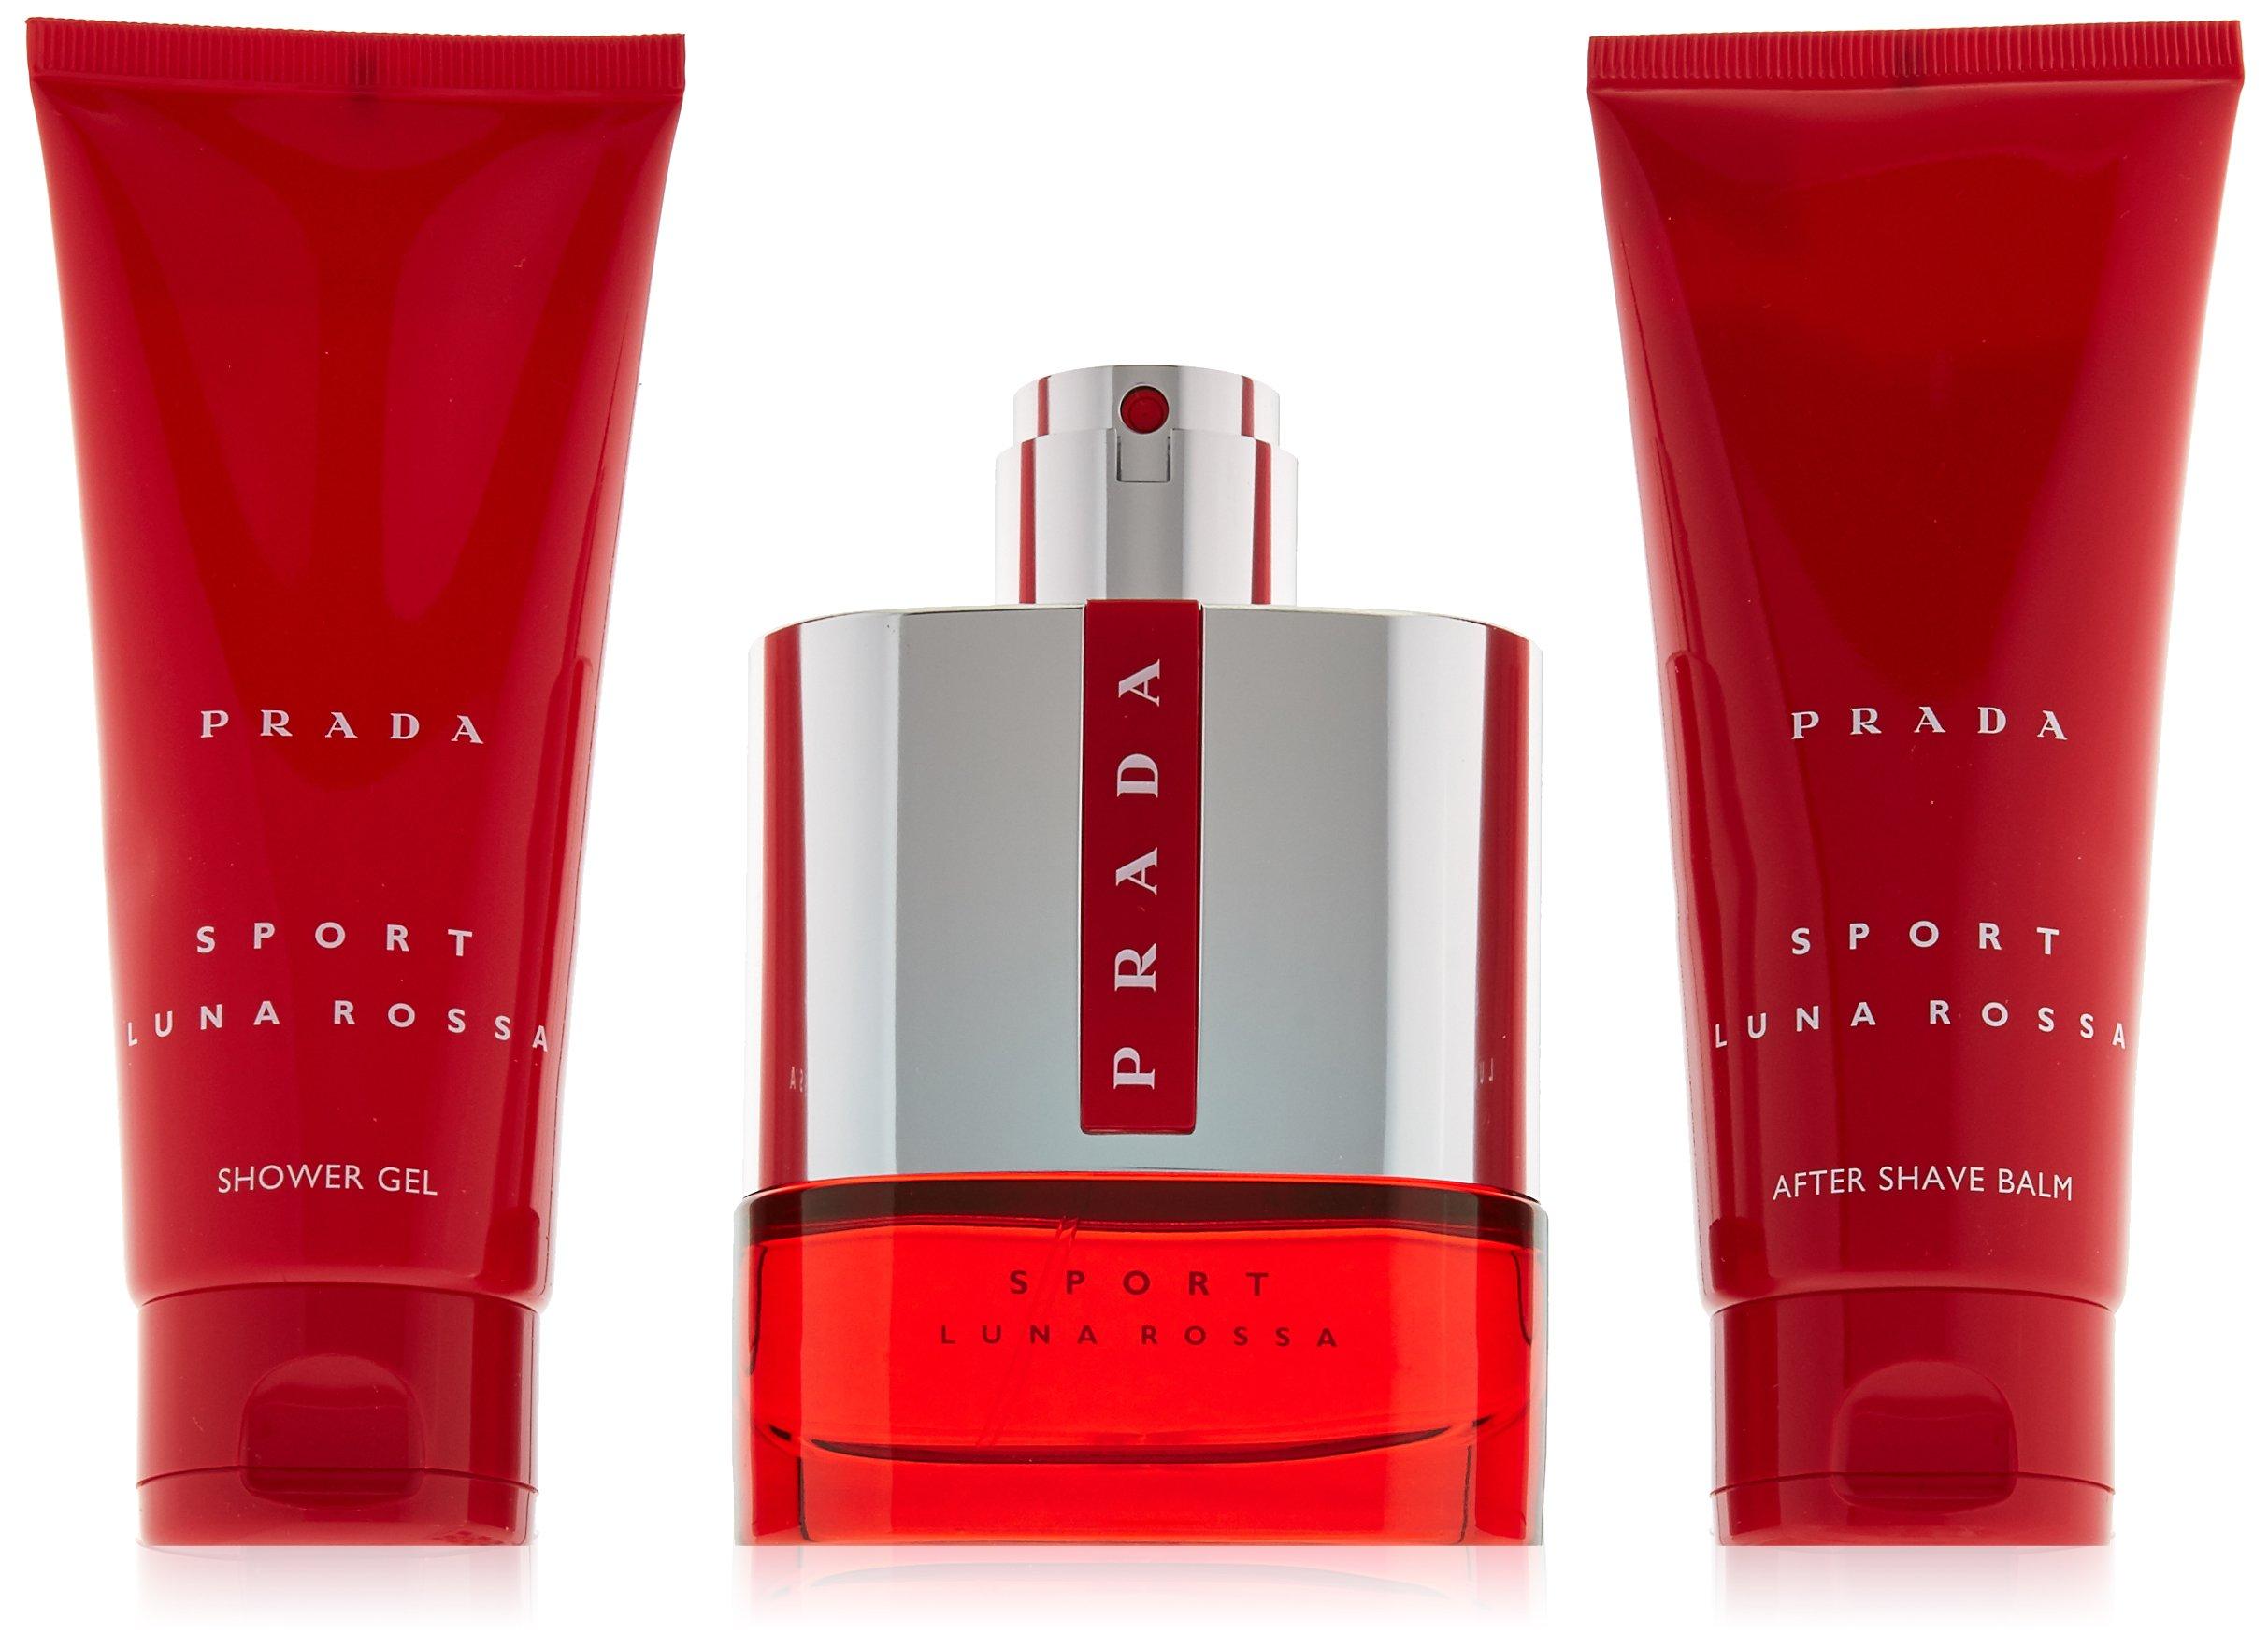 Prada Luna Rossa Sport for Men 3 PC (3.4 Eau De Toilette / 3.4 shower gel / 3.4 after shave balm) by Prada (Image #1)